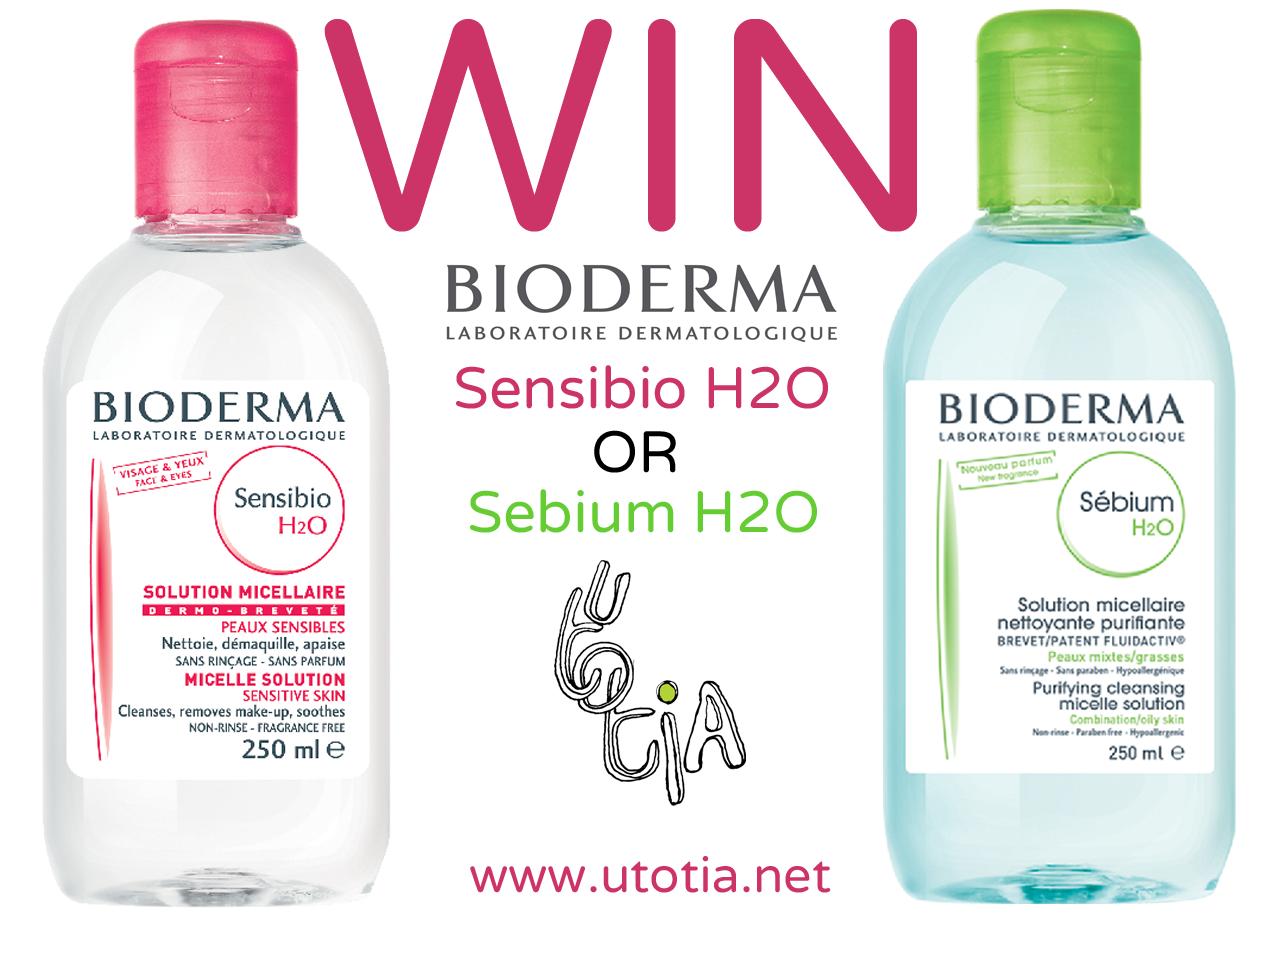 Utotia Beauty Blog September 2014 Parfum Putri Monday 15